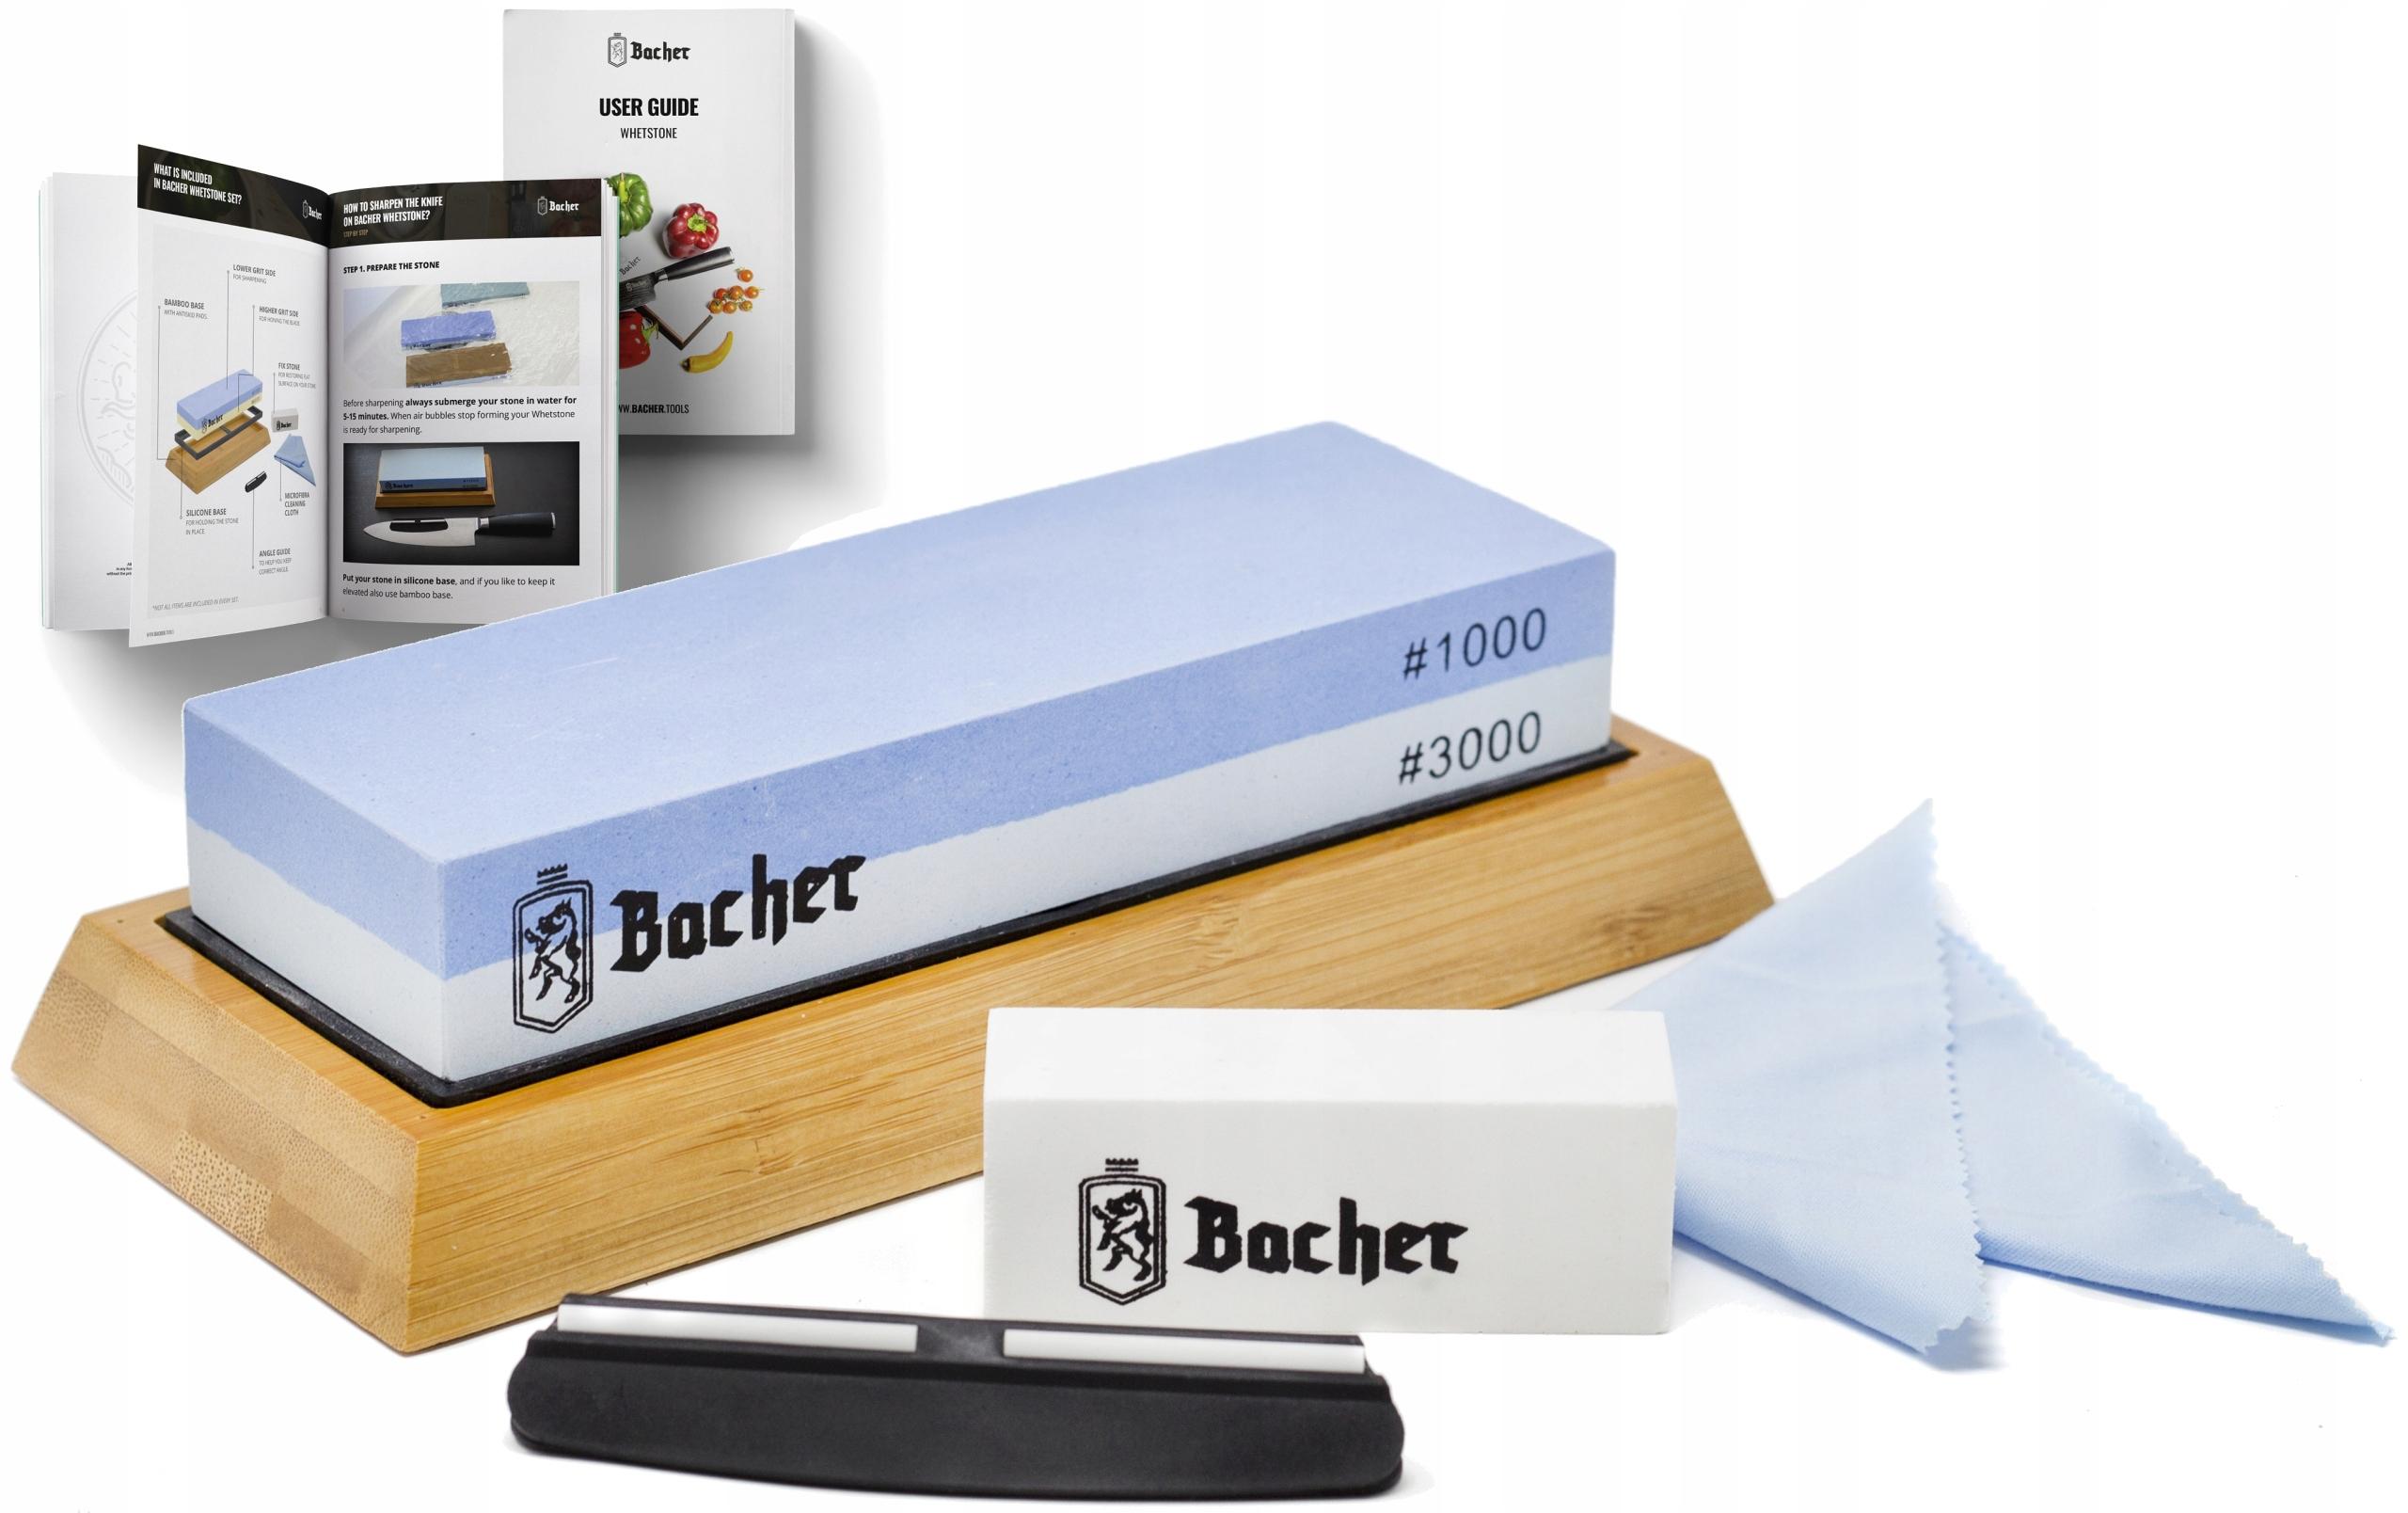 Stroj BACHER osełka kameň 1000/3000 SET+ebook